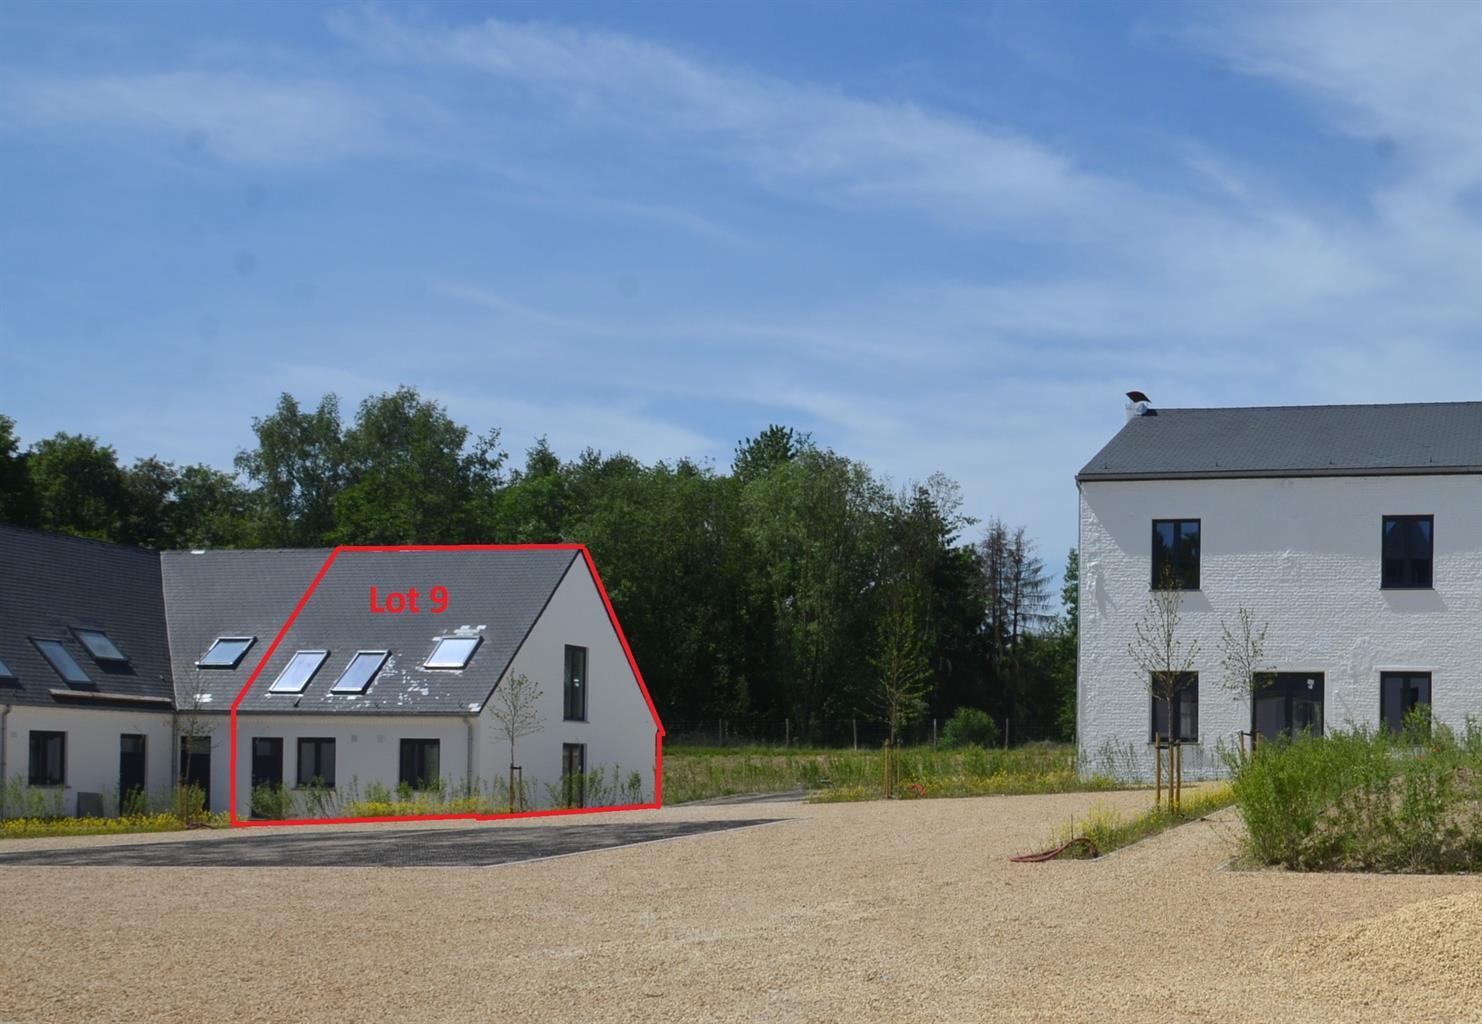 Maison - Genappe Bousval - #4074823-0